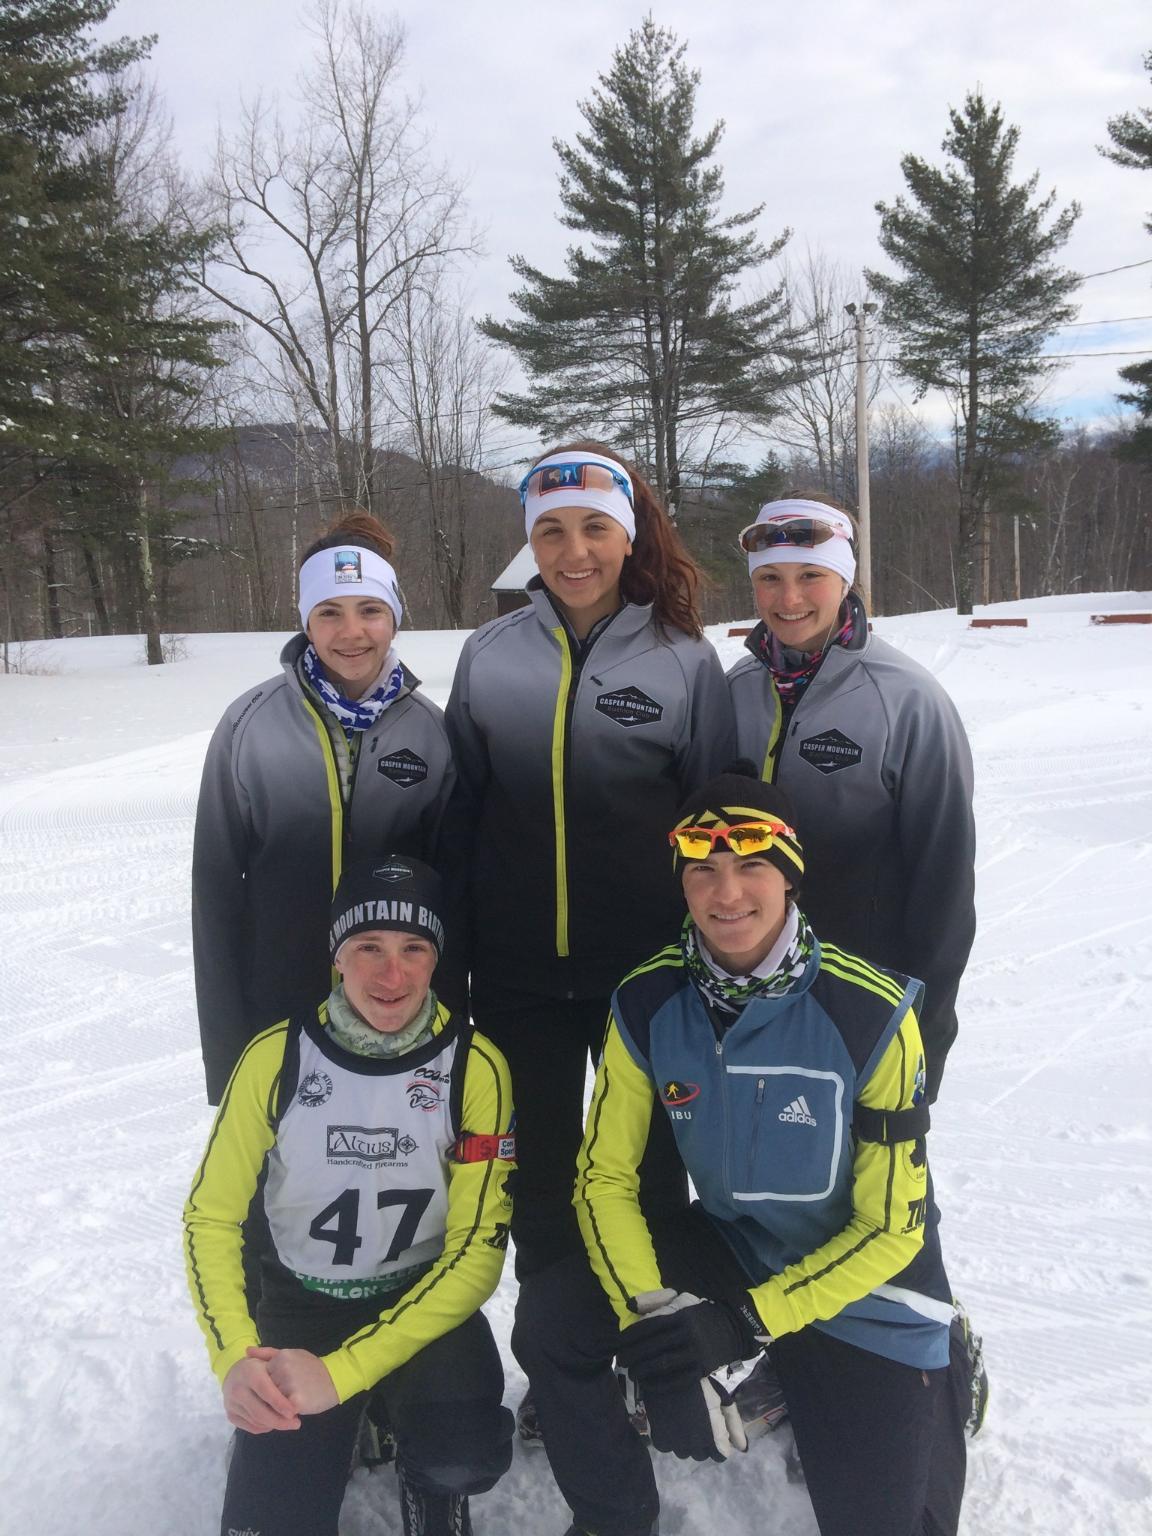 Team CMBC at US Biathlon Nationals.  Madison Tinker, Rylie Garner, Katherine Gruner, Christian Bjorklund and Jake Pearson.